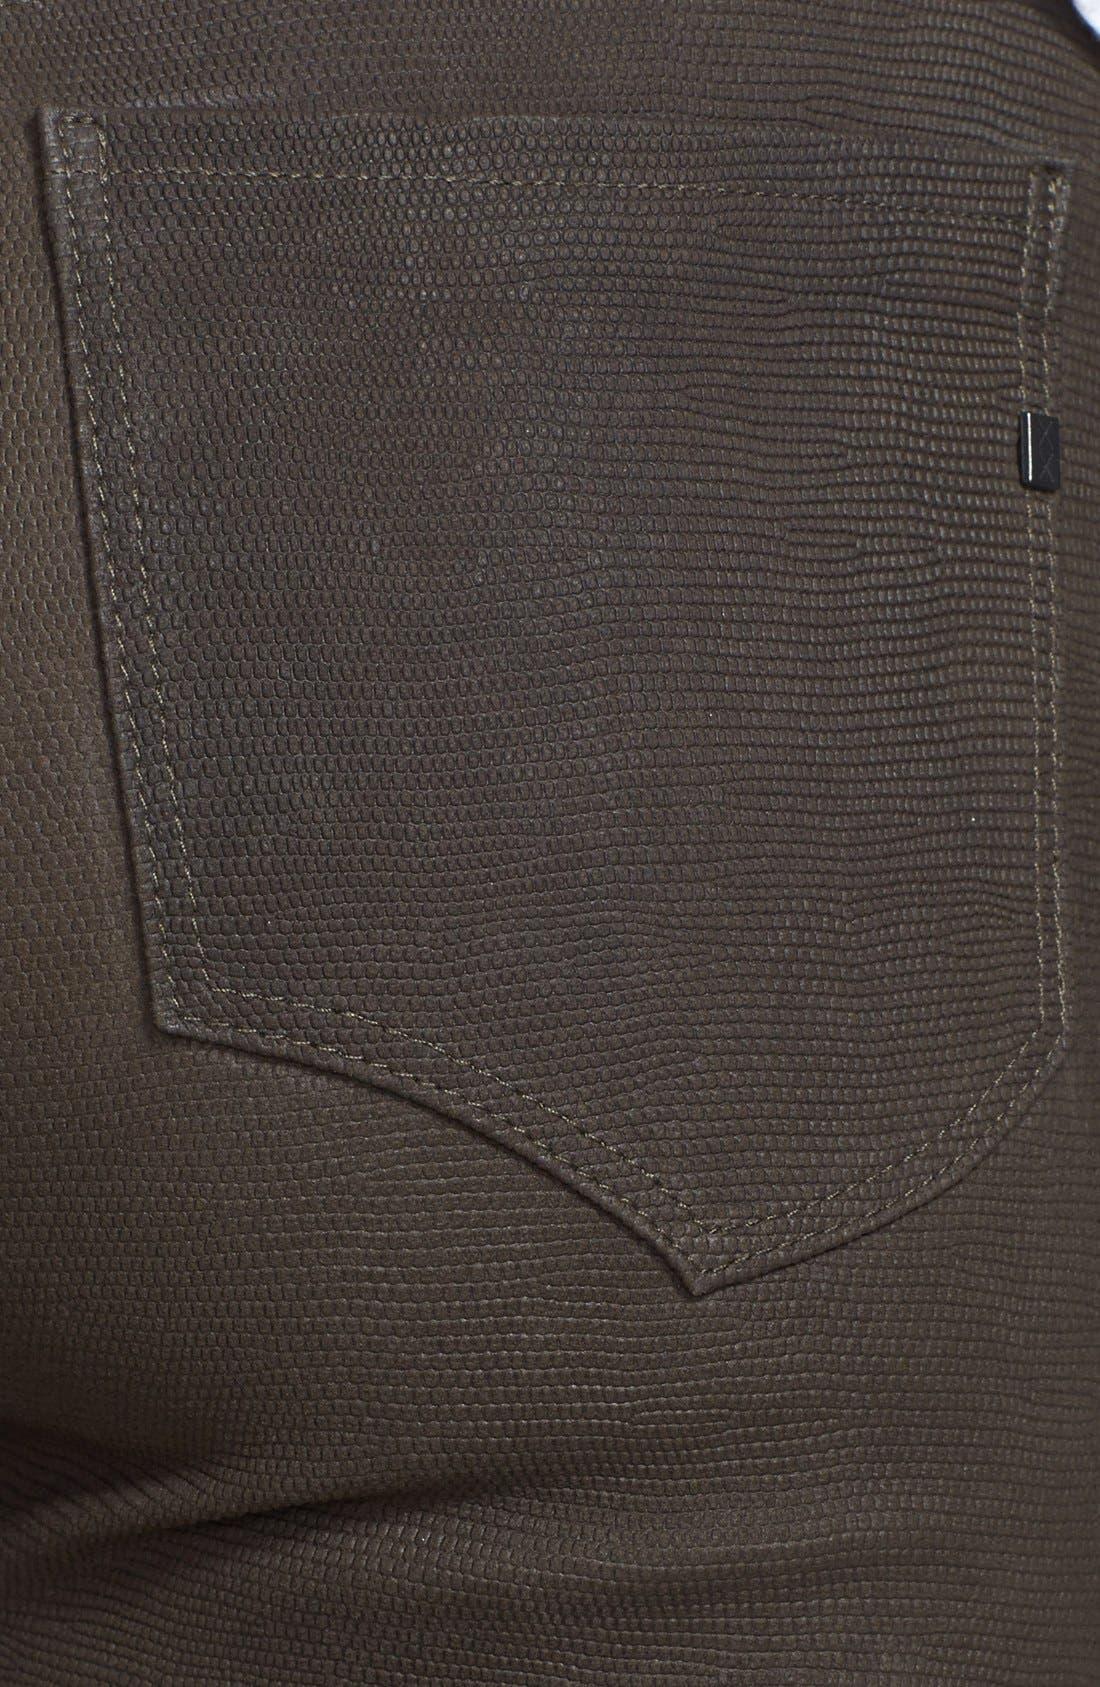 Alternate Image 3  - Genetic 'Shya' Suede Cigarette Jeans (Deep Olive)